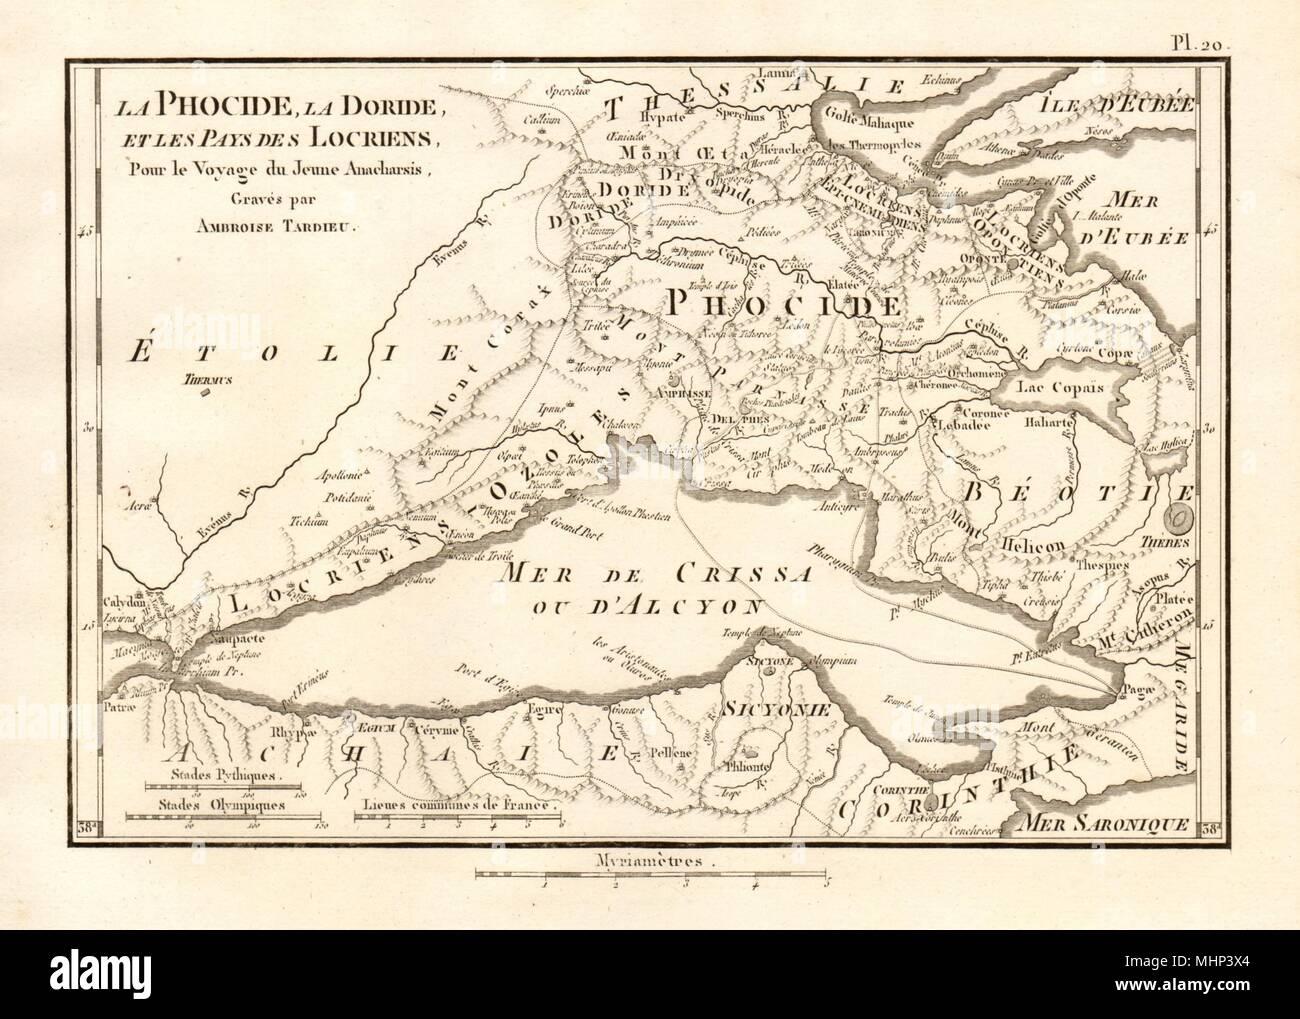 Gulf Of Corinth Ancient Greece Phocide Phocis Doride Doris